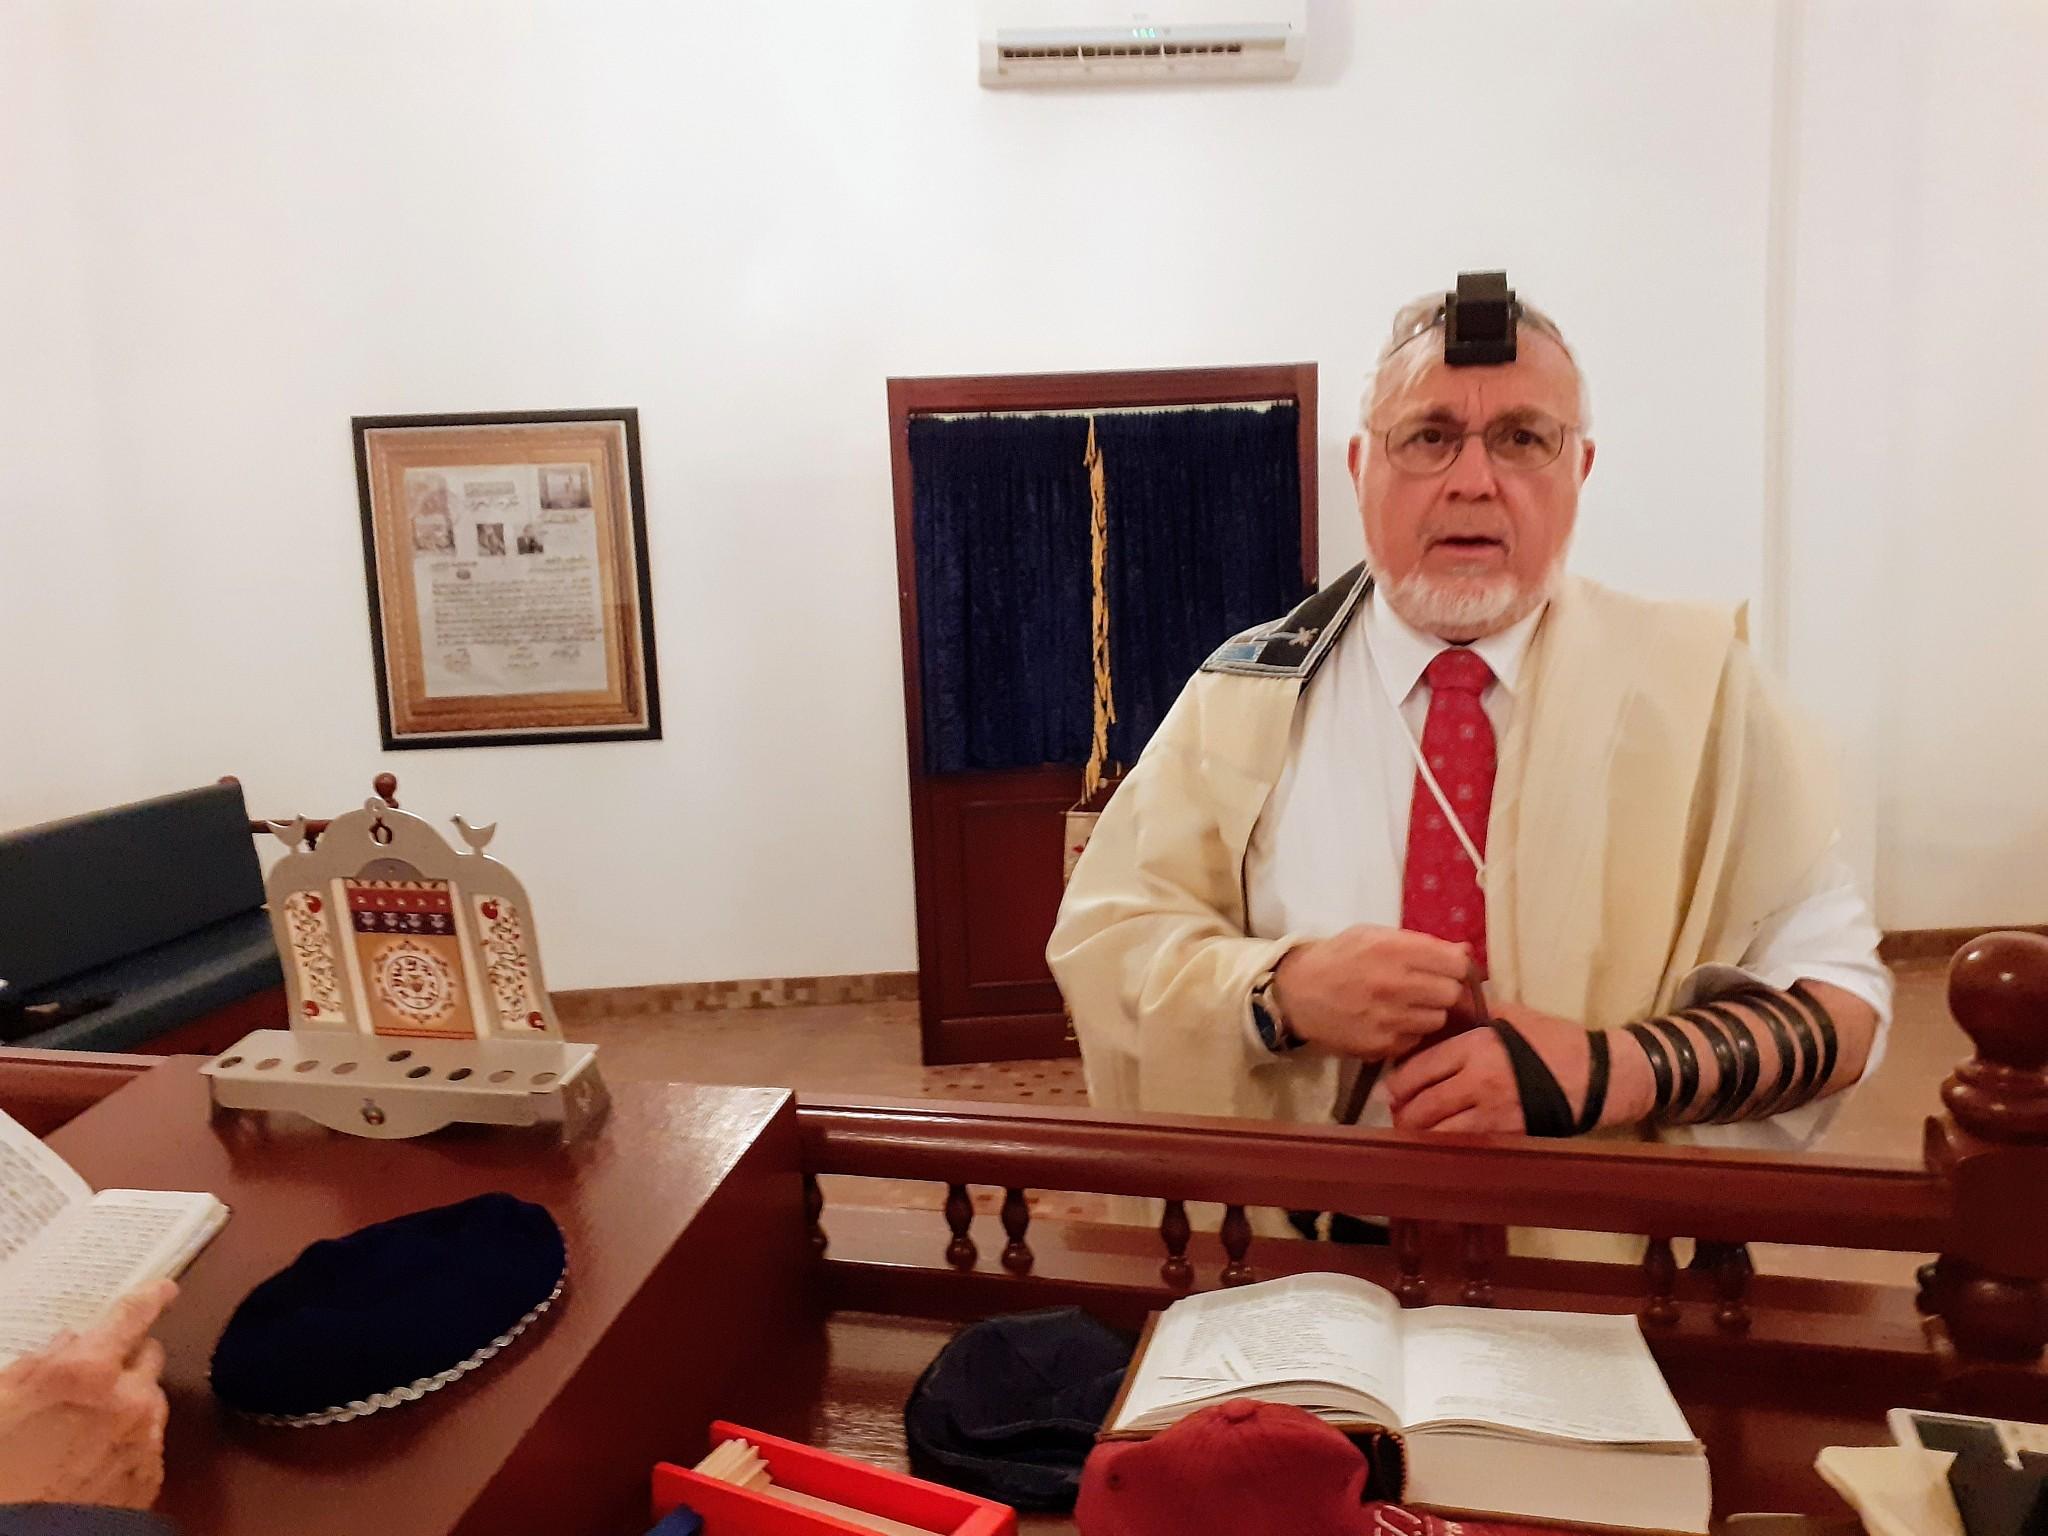 Rabbi Abraham Cooper attends the morning prayers at the Bahrain synagogue, June 25, 2019 (Raphael Ahren/TOI)